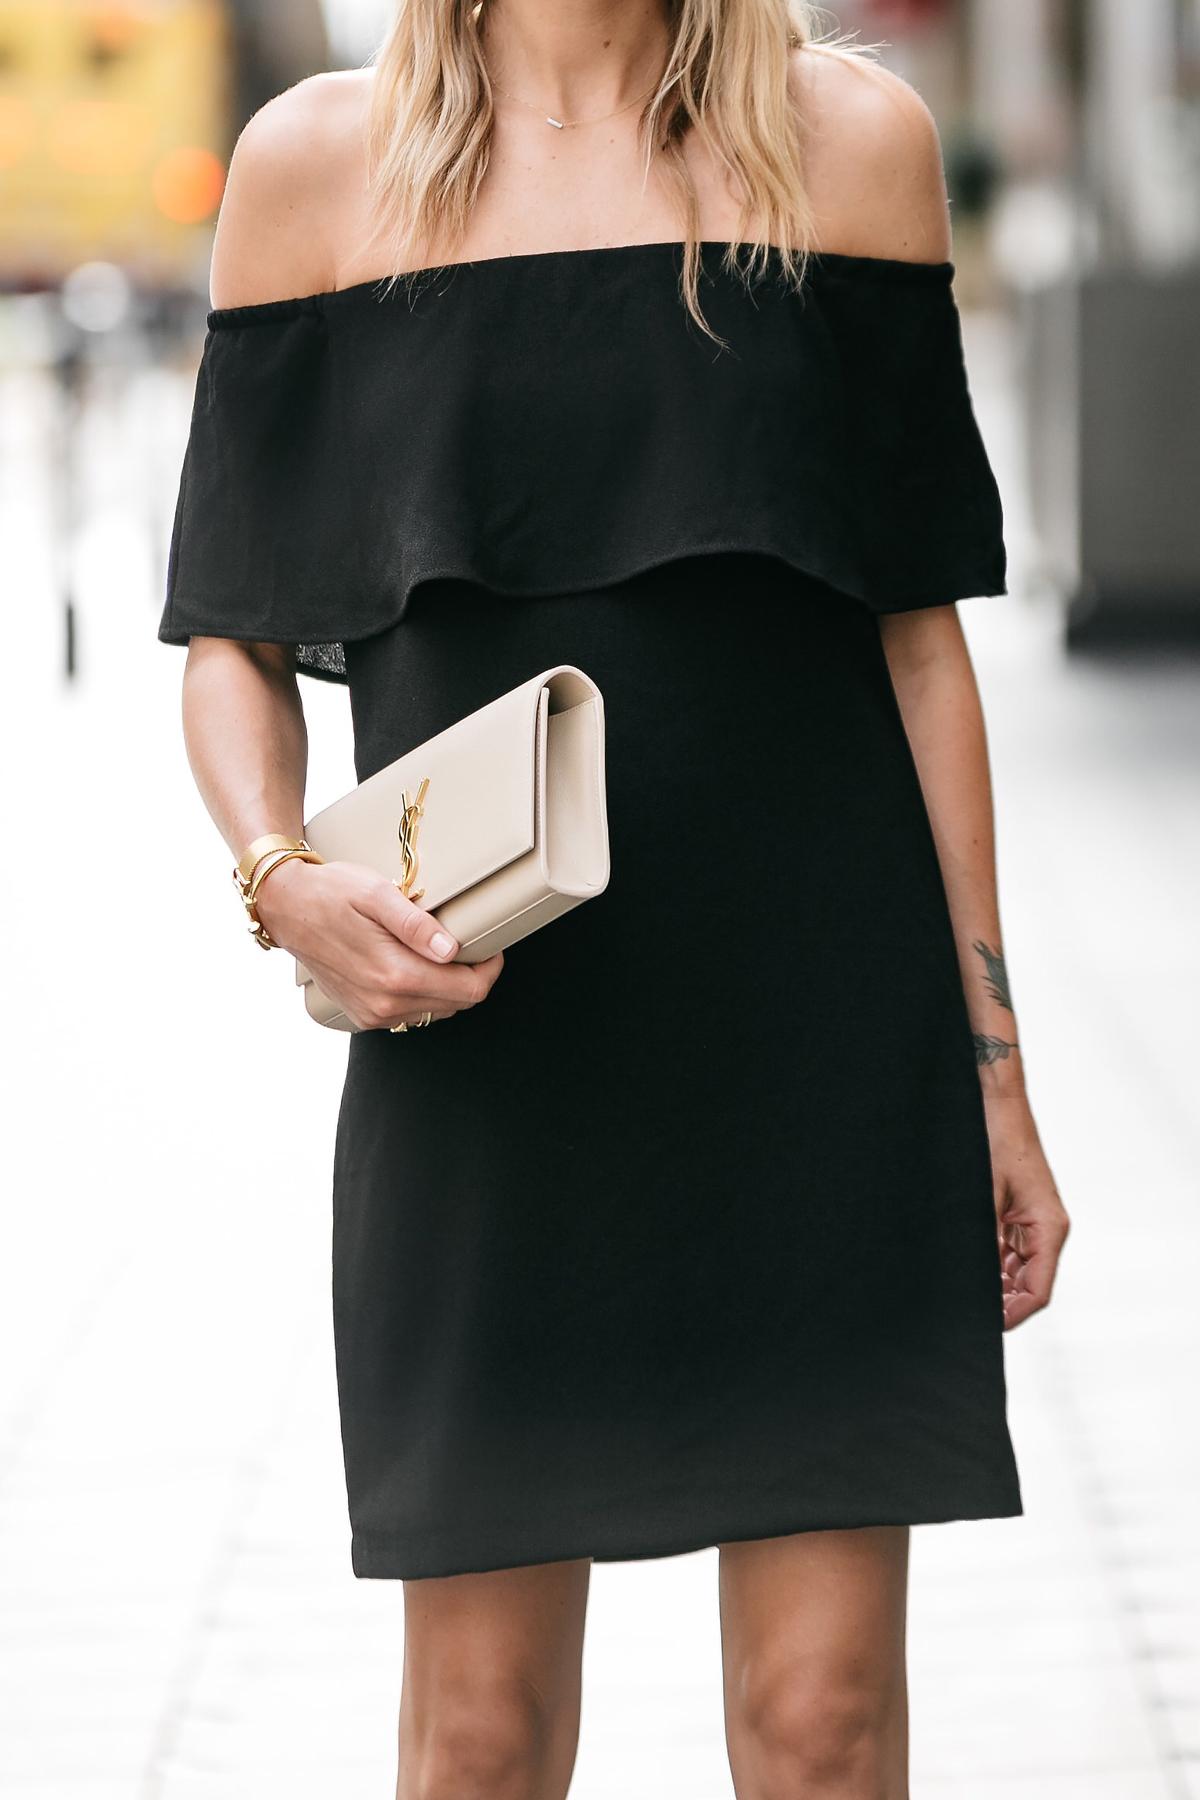 Nordstrom off the shoulder black dress YSL nude clutch little black dress street style dallas blogger fashion blogger